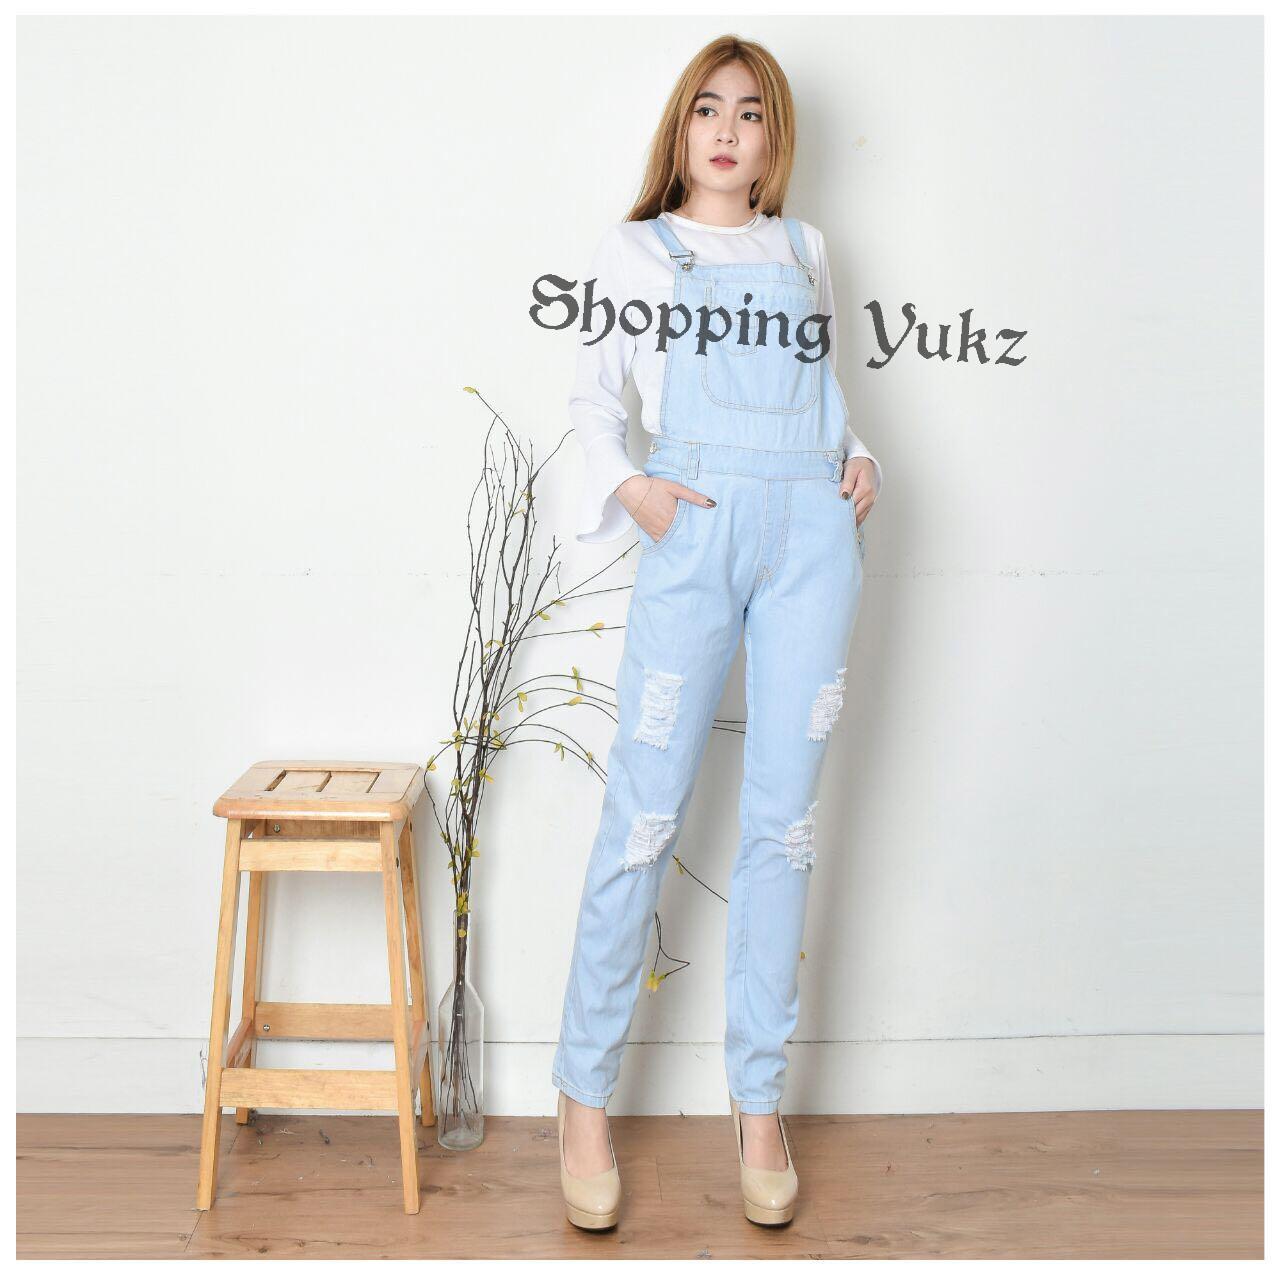 Shopping Yukz Overall Jumpsuit Jeans Denim Hijab Wanita EMNA (Tanpa Inner+Jilbab)/Baju Kodok Jeans Muslim /Jumpsuit Jeans Hijab/Ripped Jeans/Jumpsuit Denim Wanita/Jumpsuit Murah/Jumpsuit Muslim/Jumpsuit Panjang/Jumpsuit Hijab/Jumsuit Wanita/Jumsuit Denim